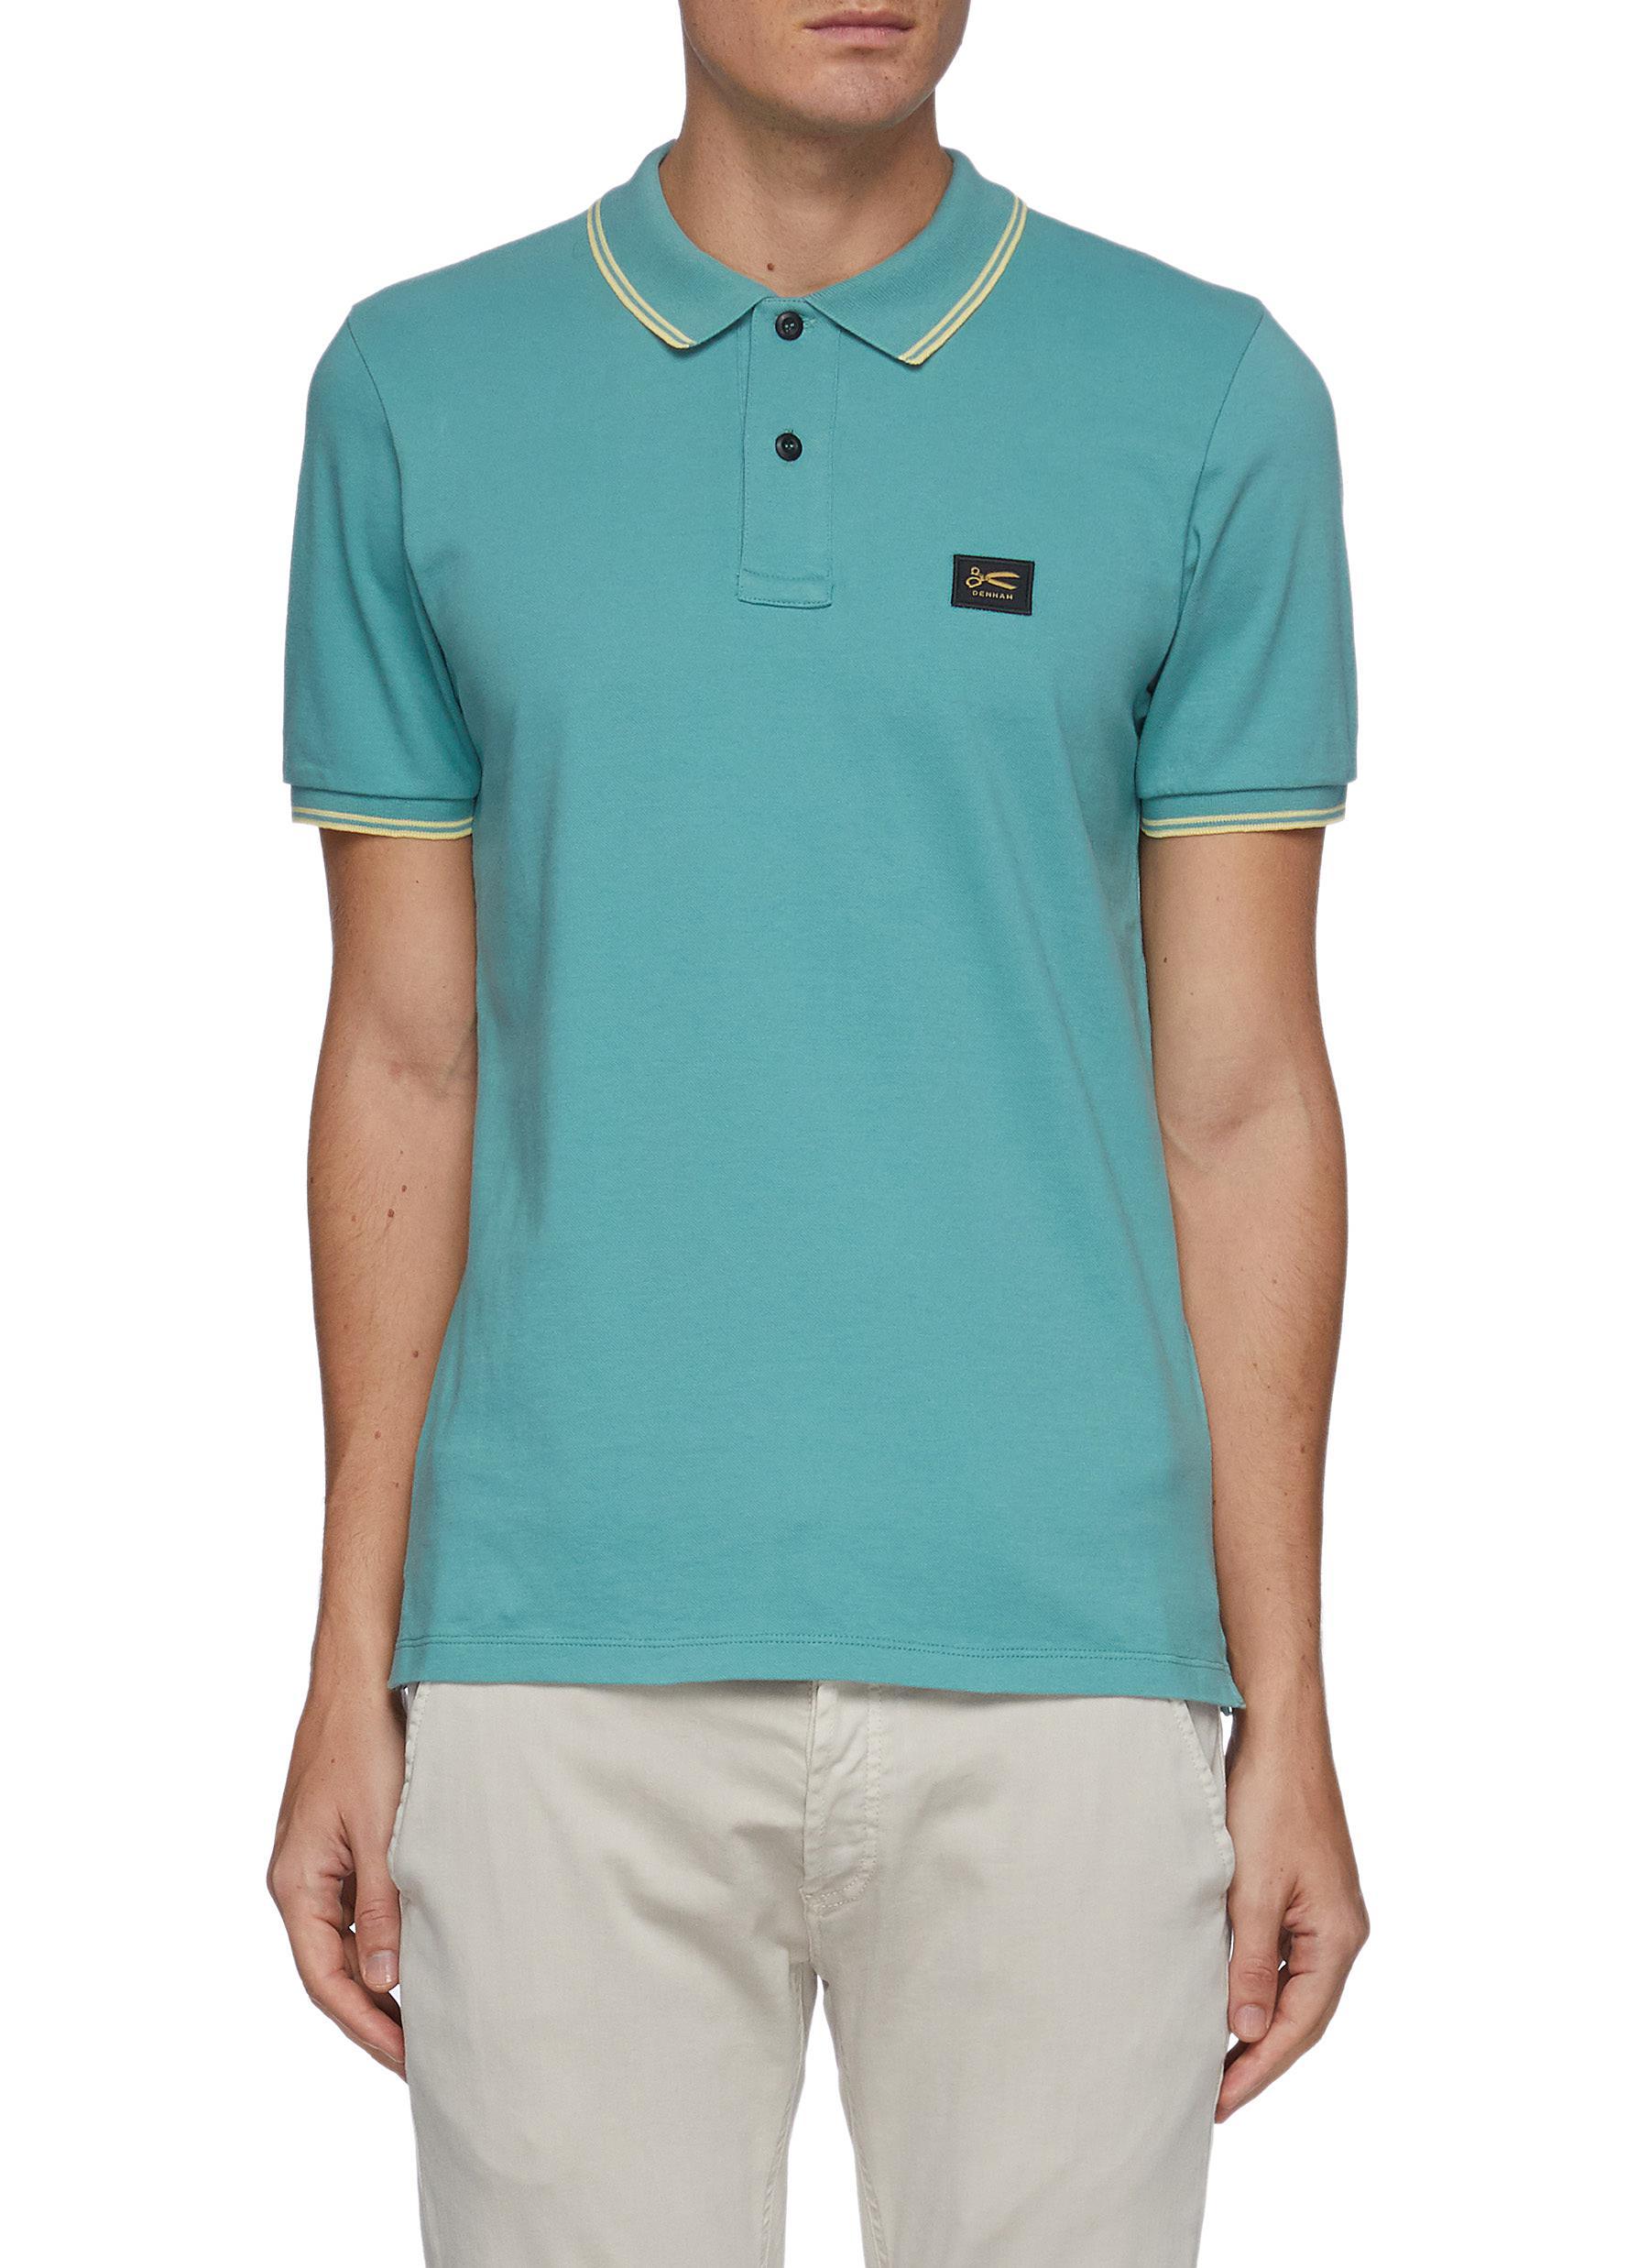 'Regency' Logo Patch Contrast Stripe Edge Cotton Polo Shirt